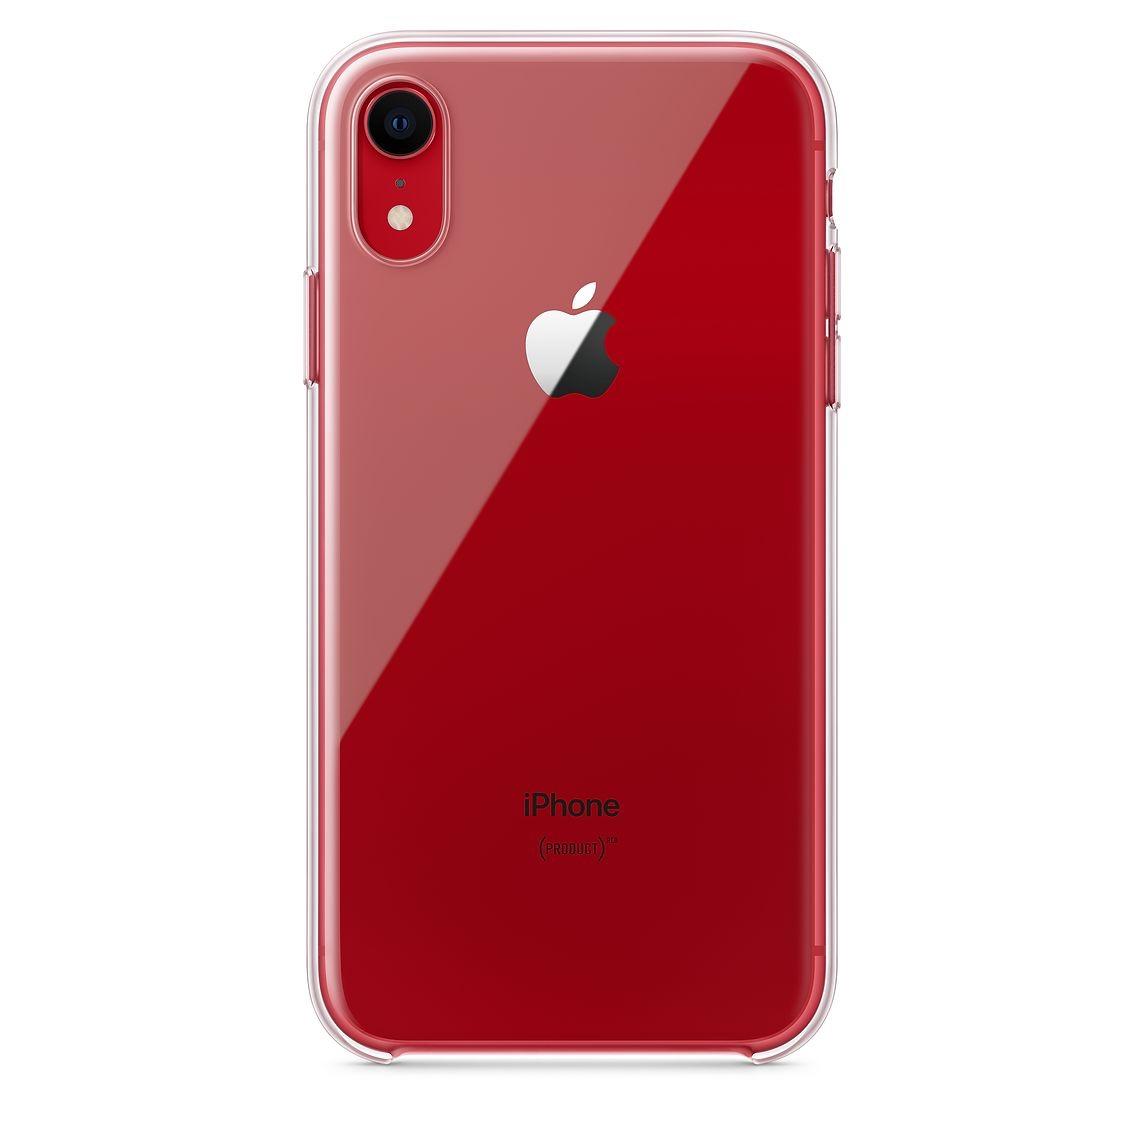 iPhone Clear Case.jpg